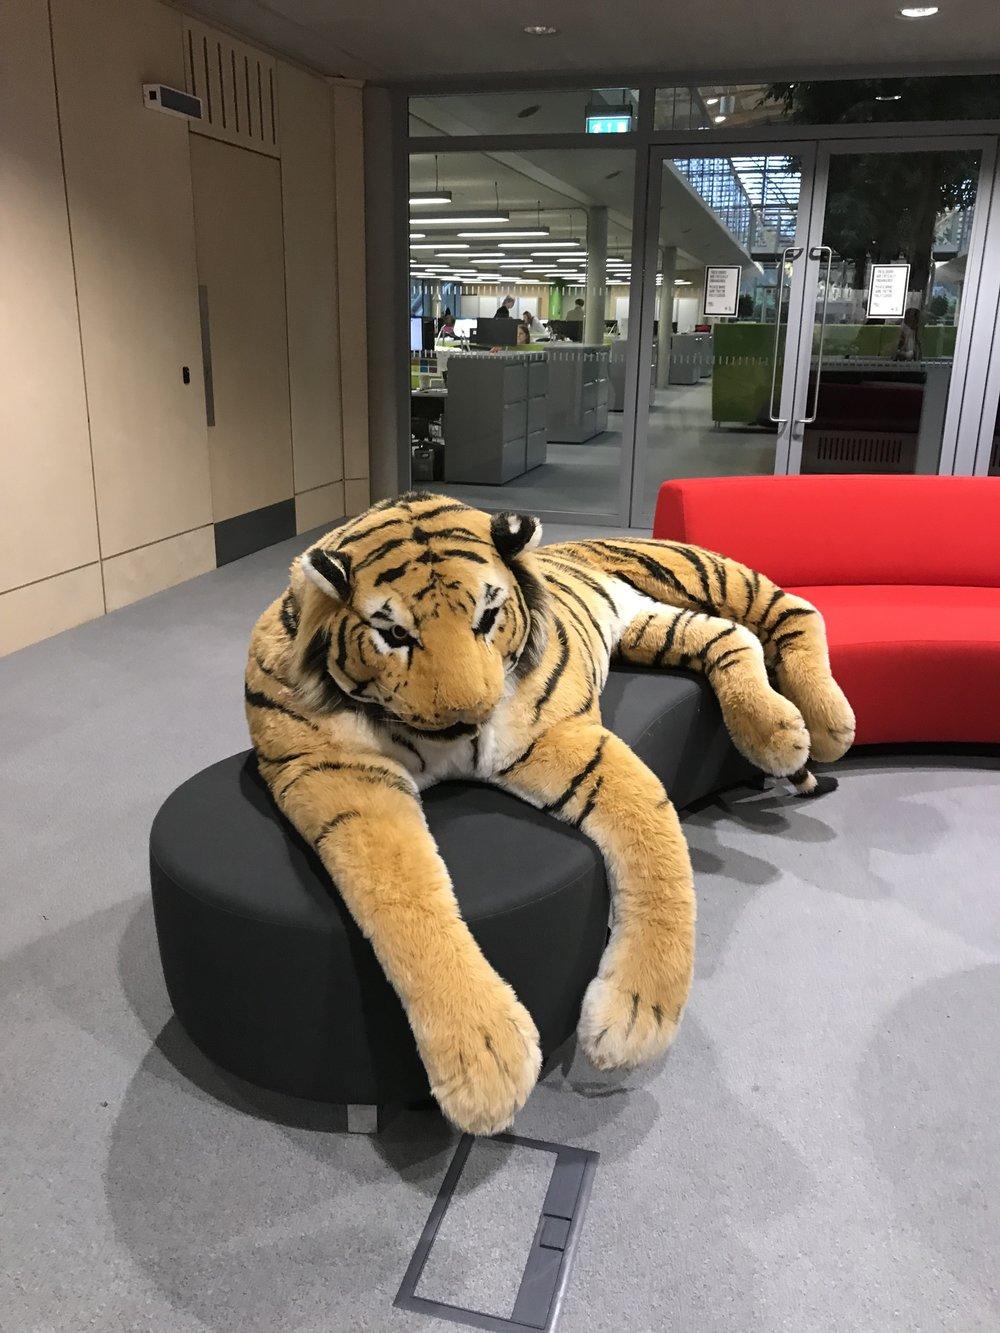 Life-size Tiger